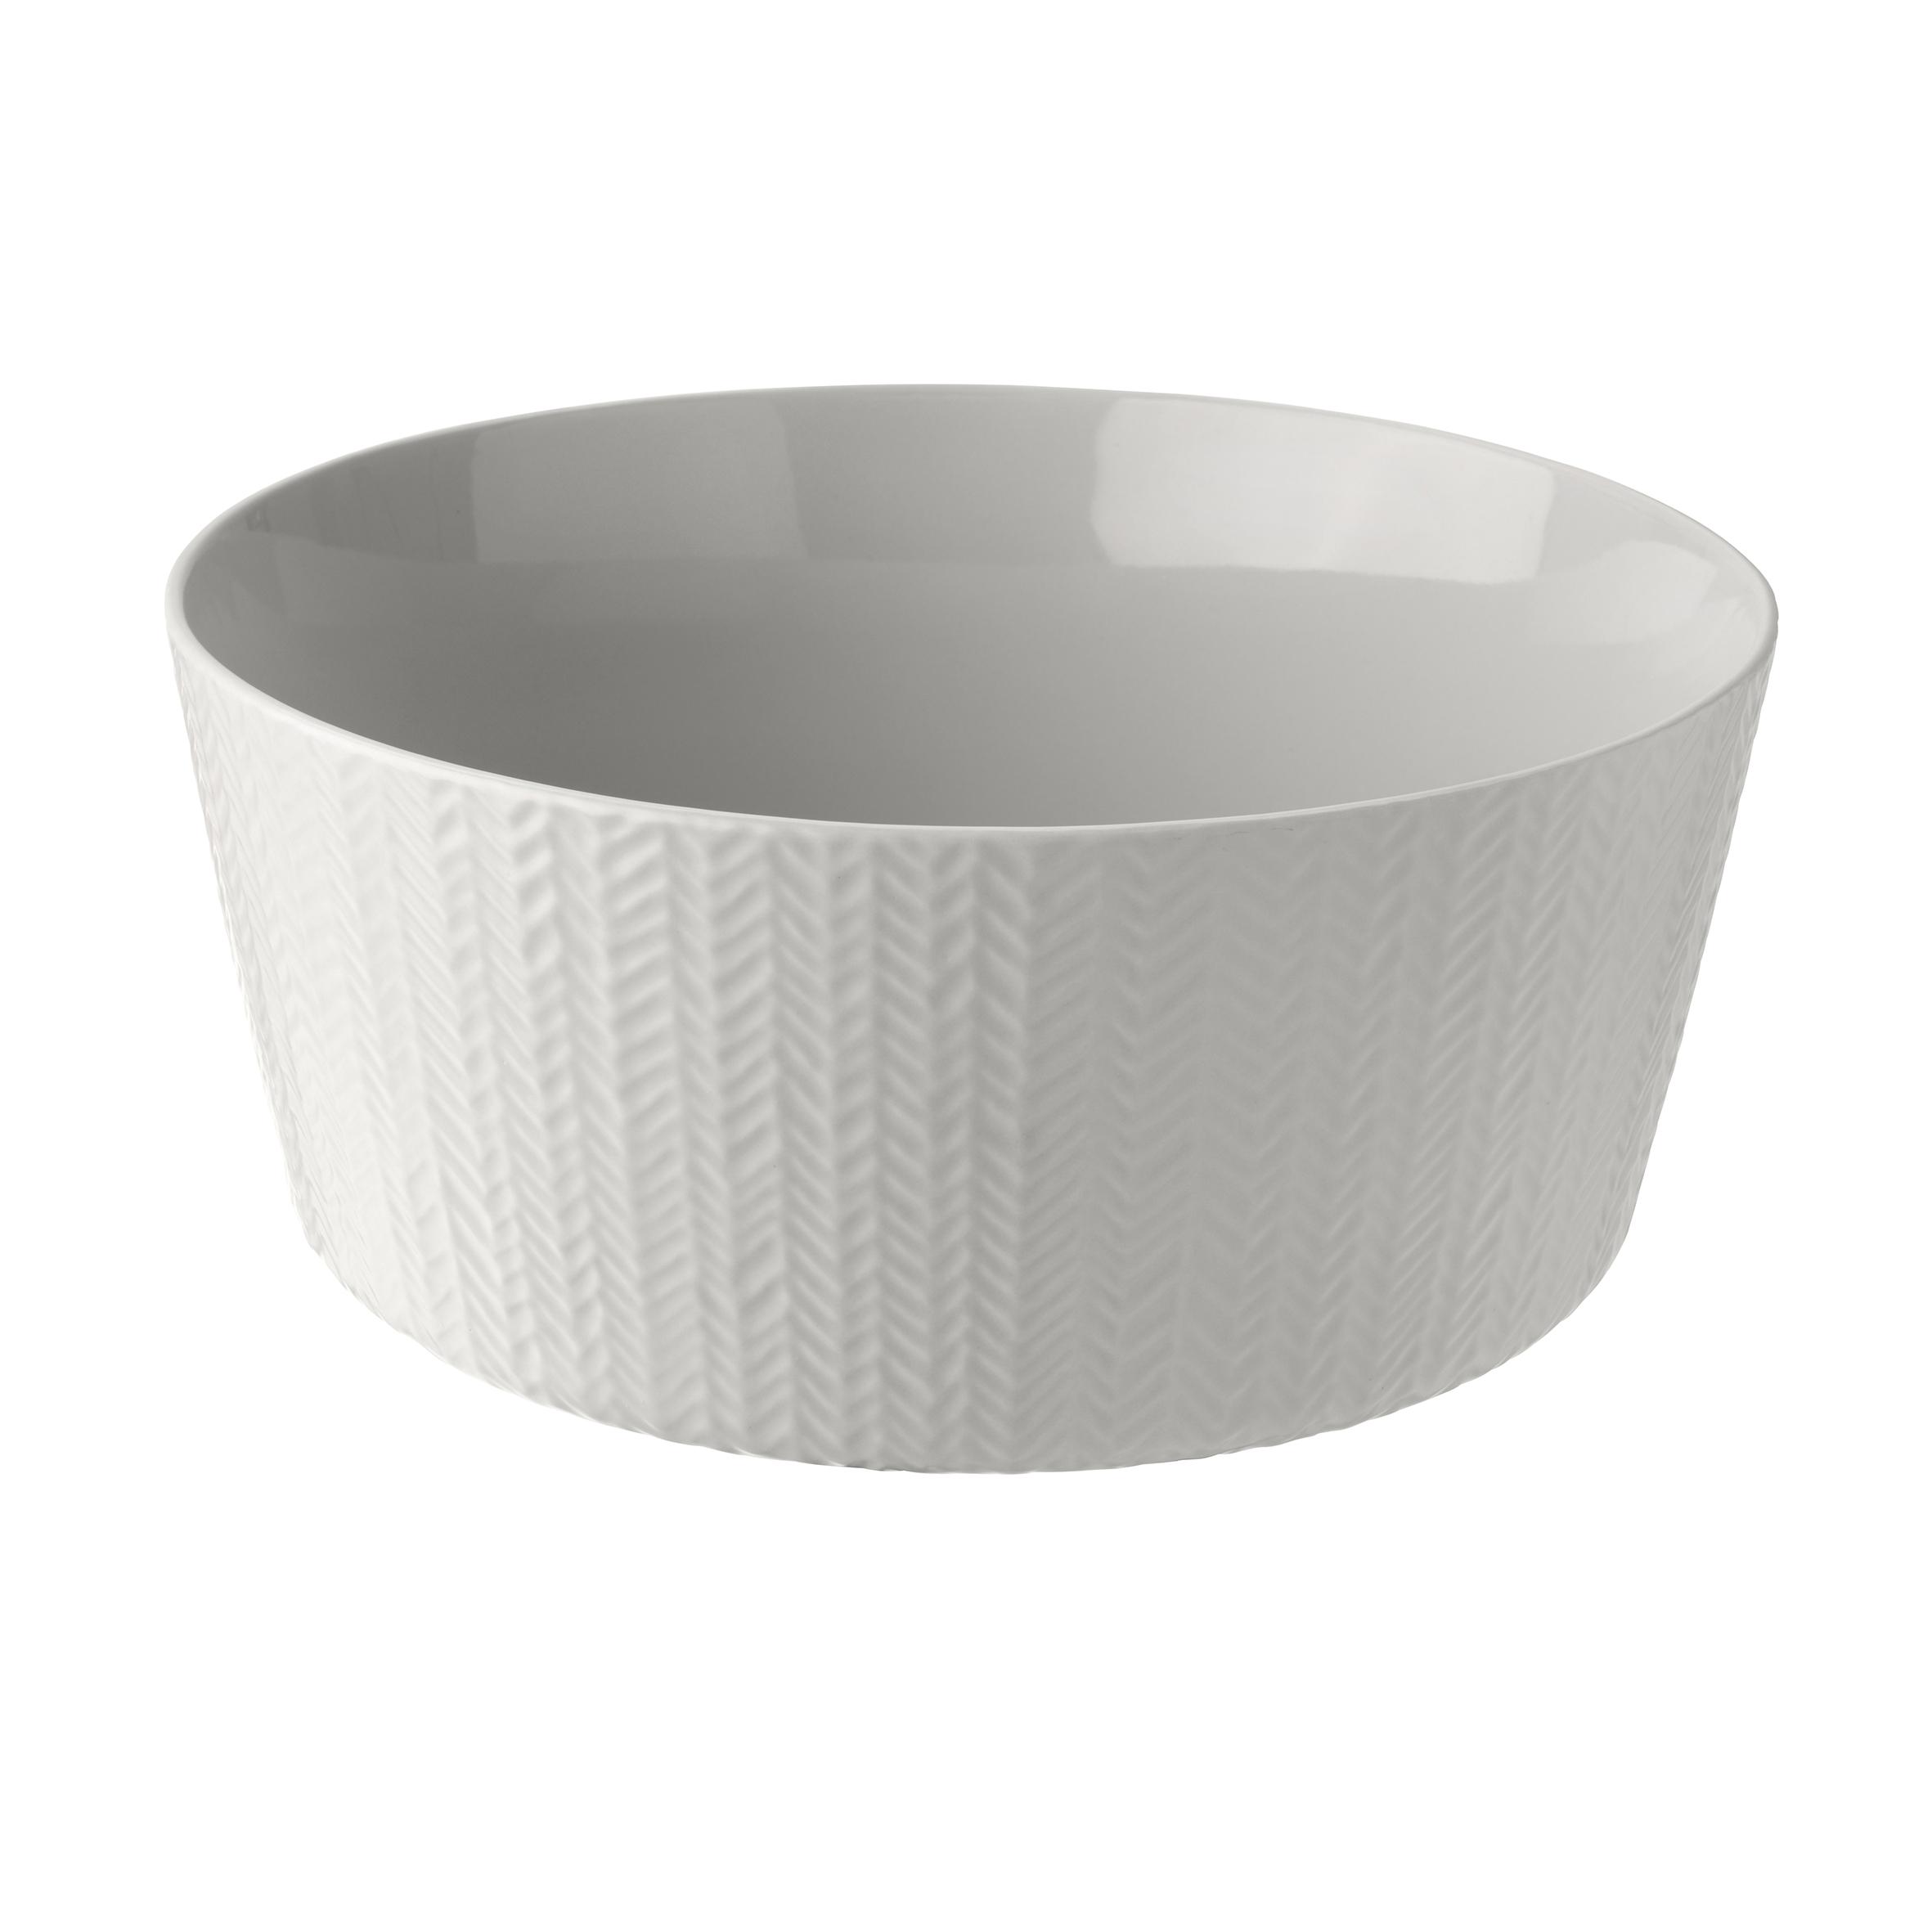 IKEA_VINTER2017_serveringsskal_monstrad_ljusgra_PE646256.jpg